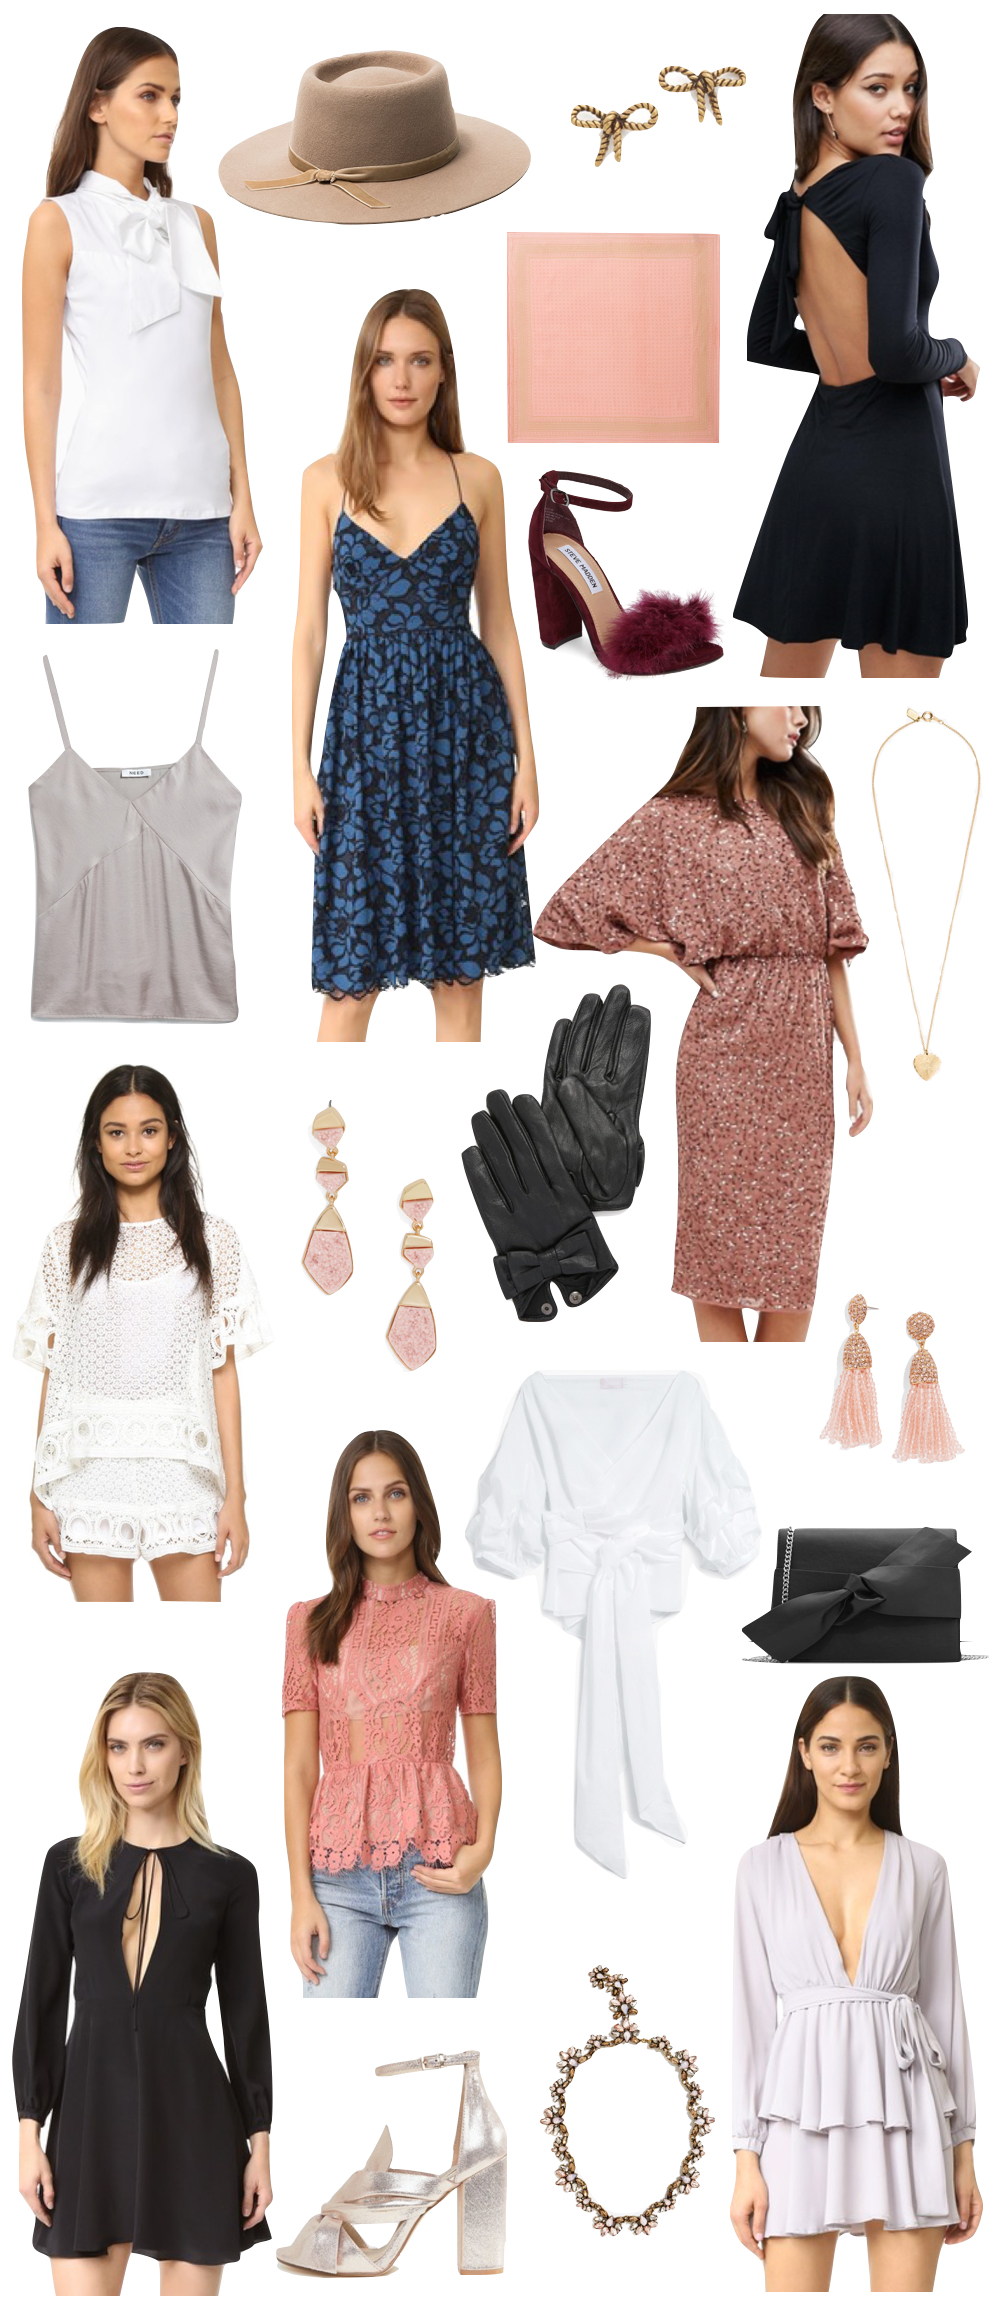 Feminine Style Under $100 - Kelly's Chic | The Stripe Blog